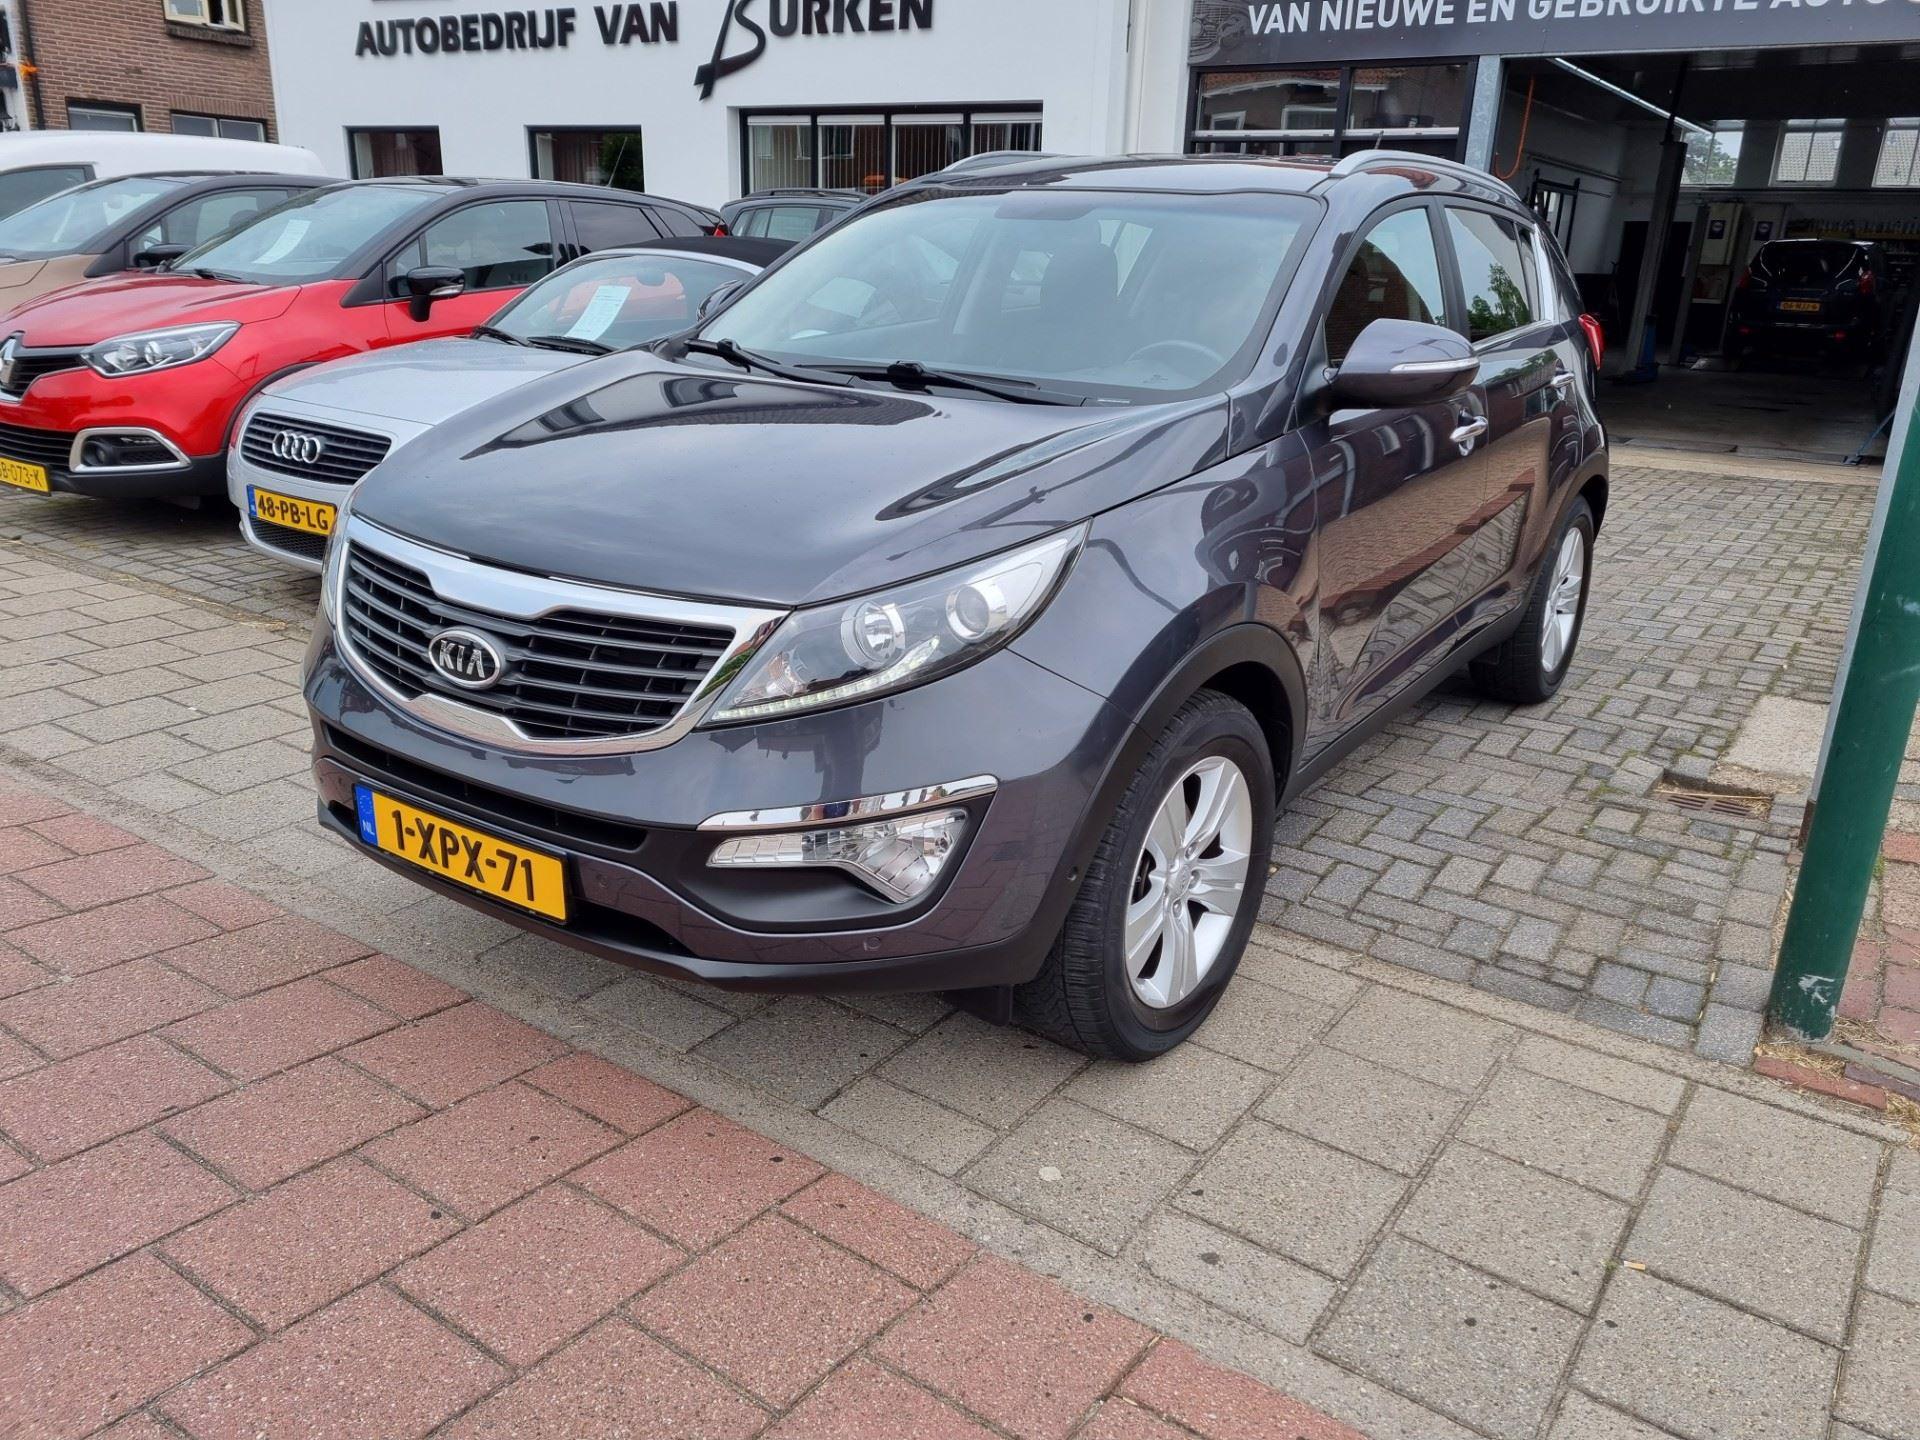 Kia Sportage occasion - Autobedrijf van Burken